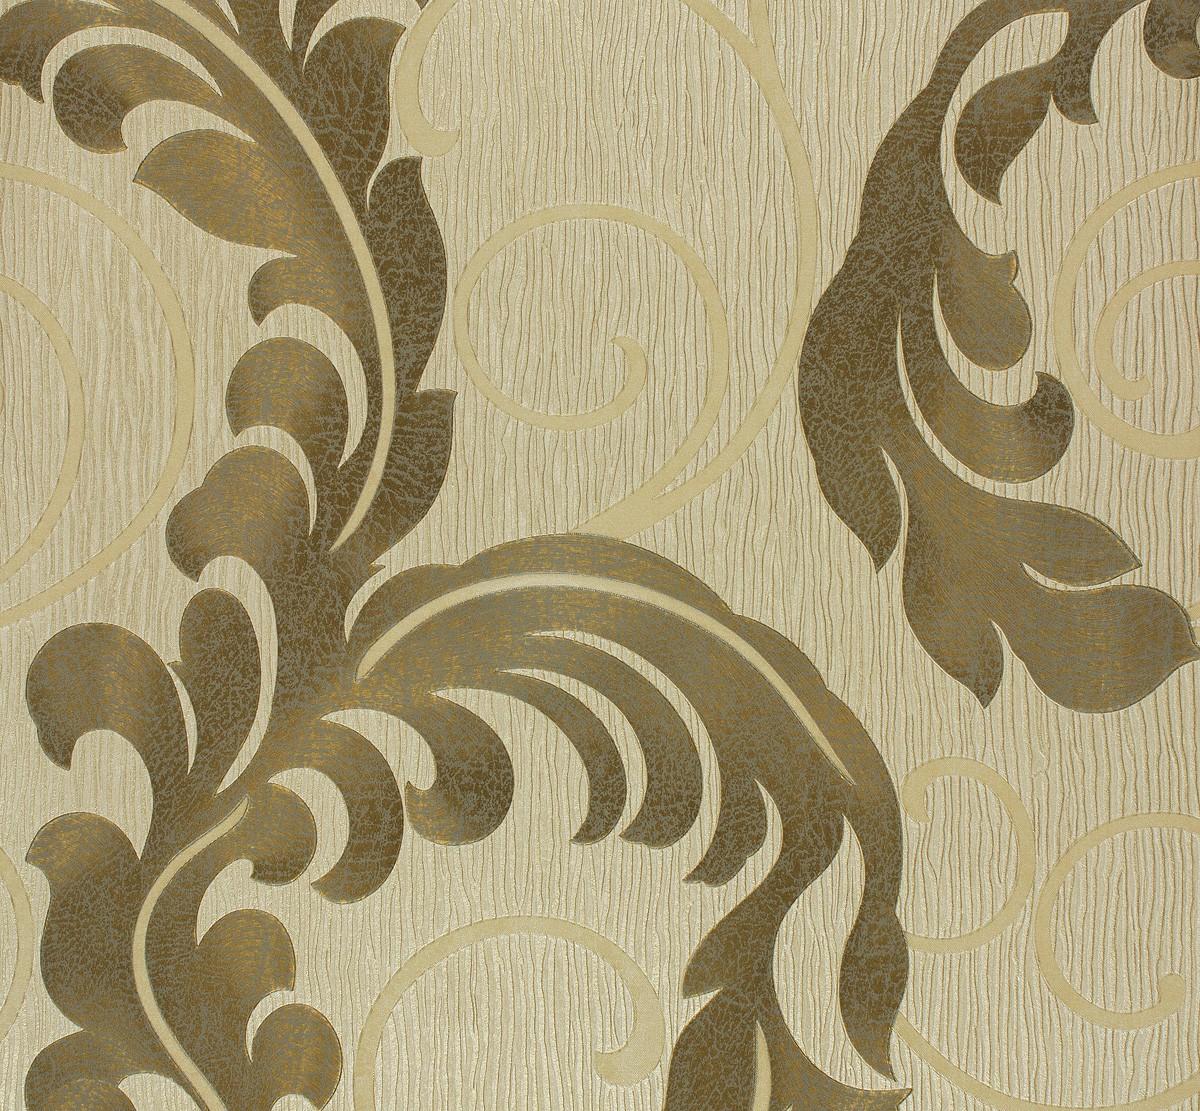 vliestapete ranken beige gold marburg da milano 55102. Black Bedroom Furniture Sets. Home Design Ideas